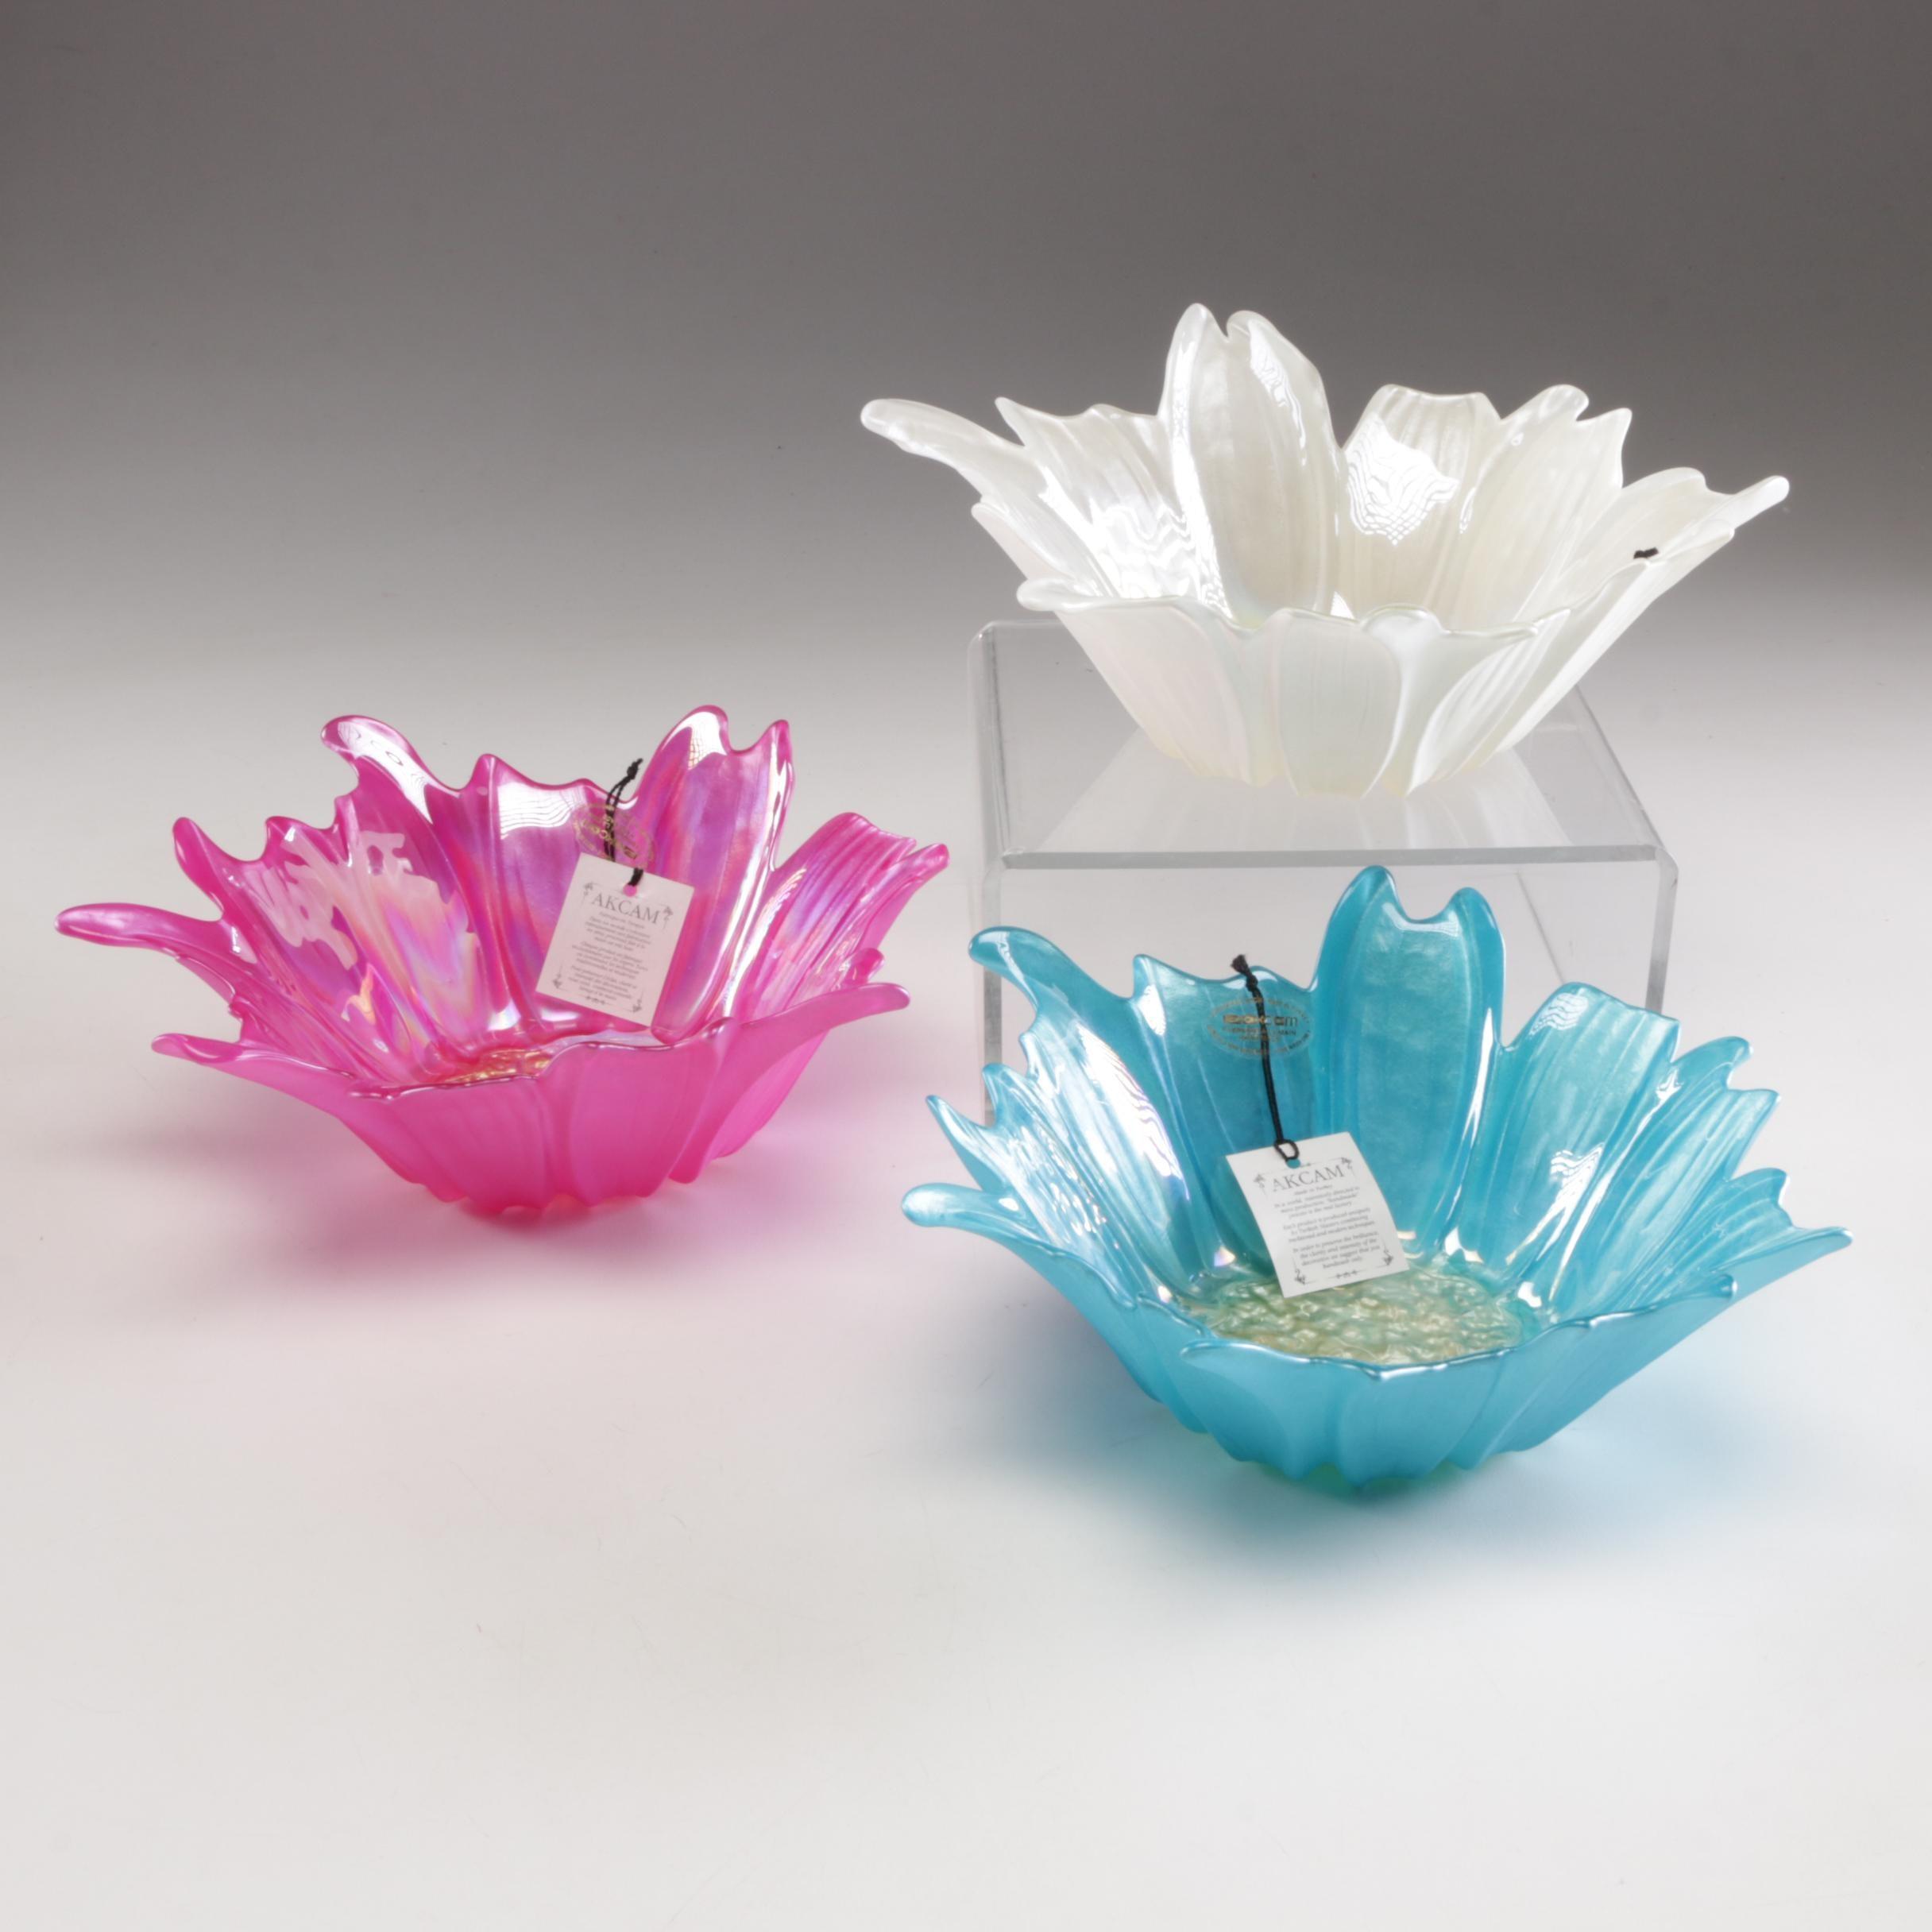 Akcam Turkish Art Glass Decorative Bowls